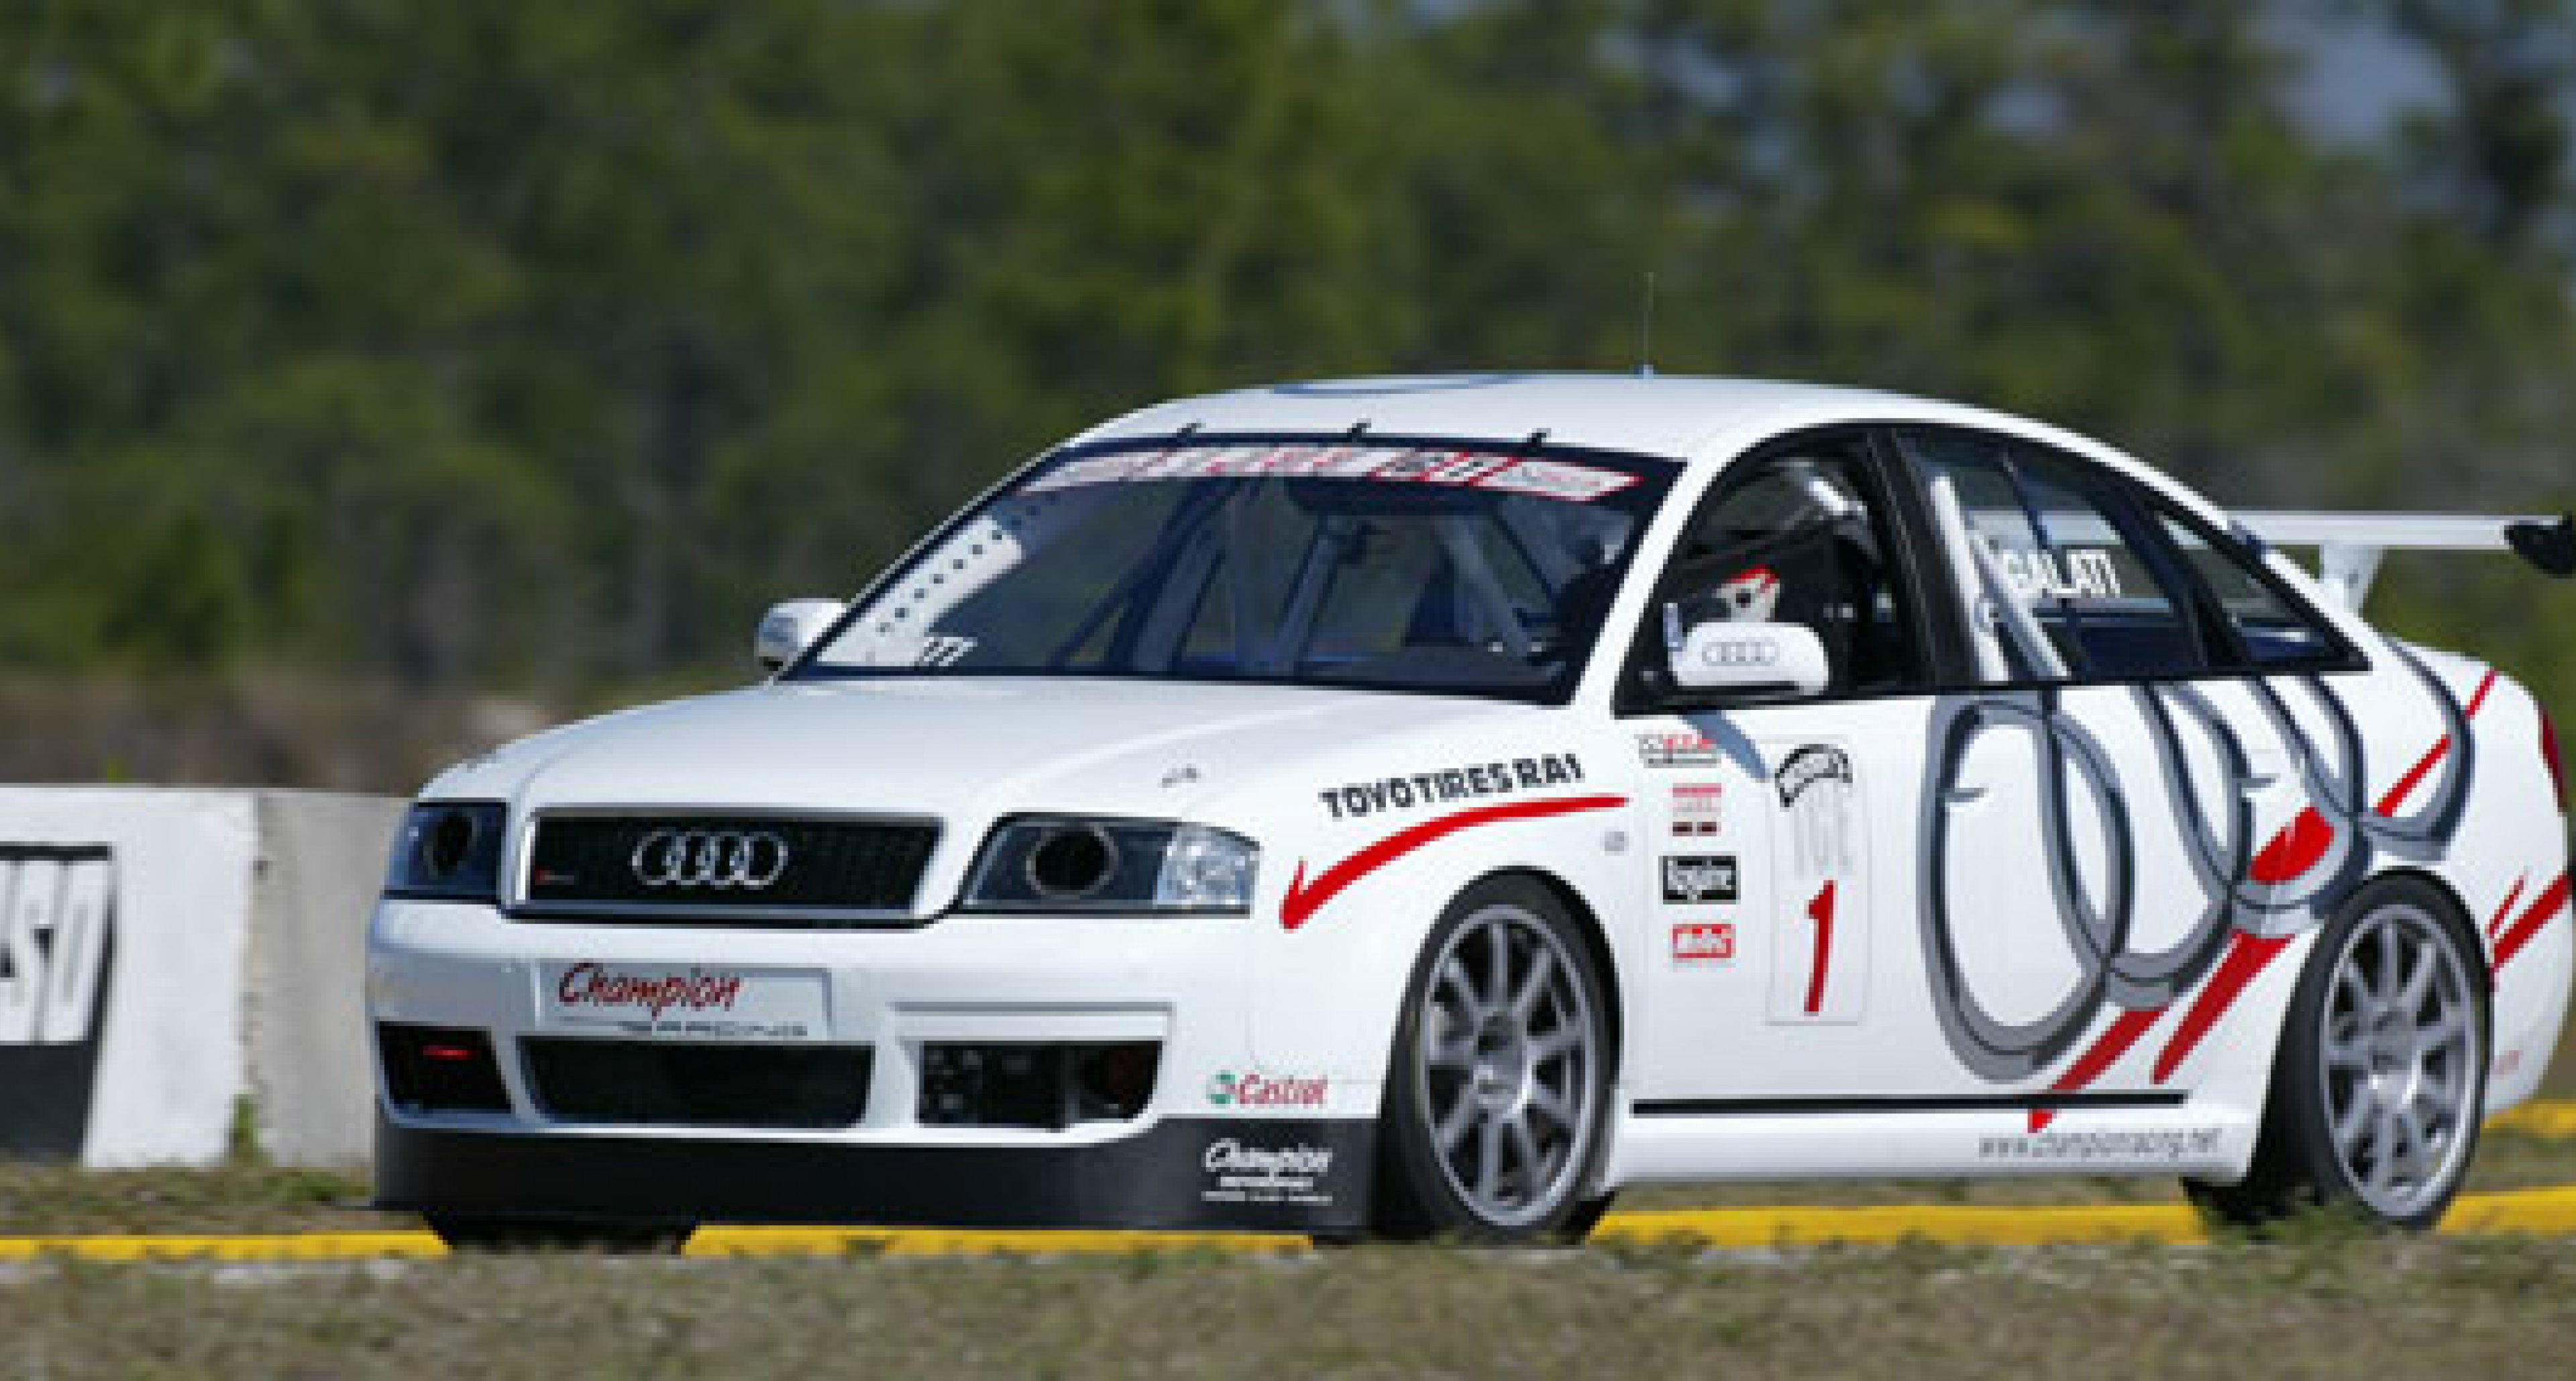 Motorsport debut for the Audi RS6